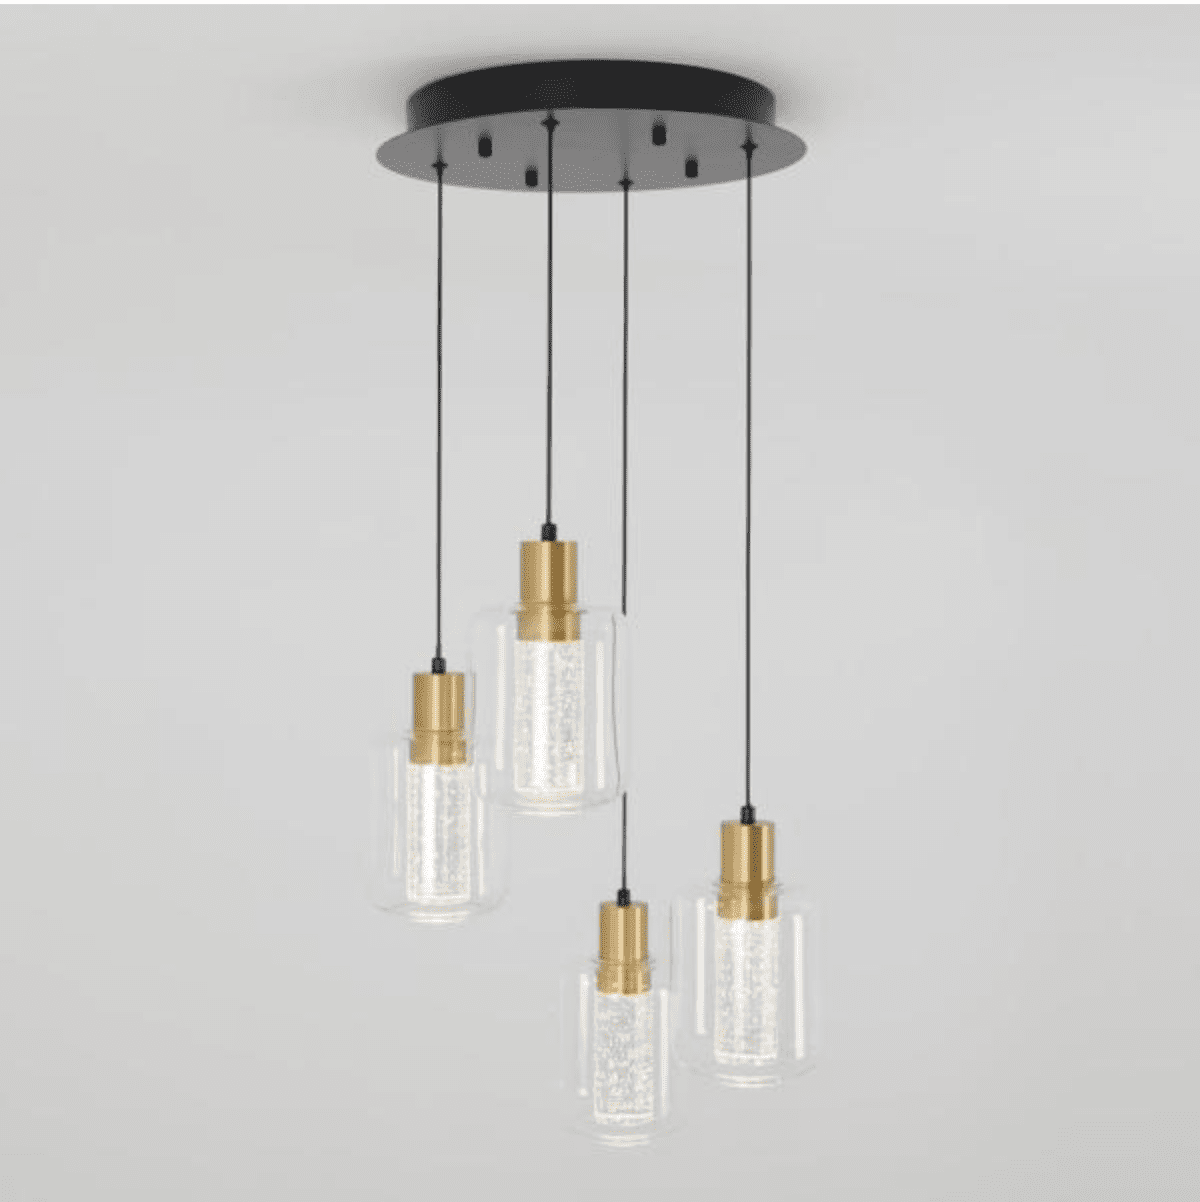 Home Depot: Select Lighting for sale